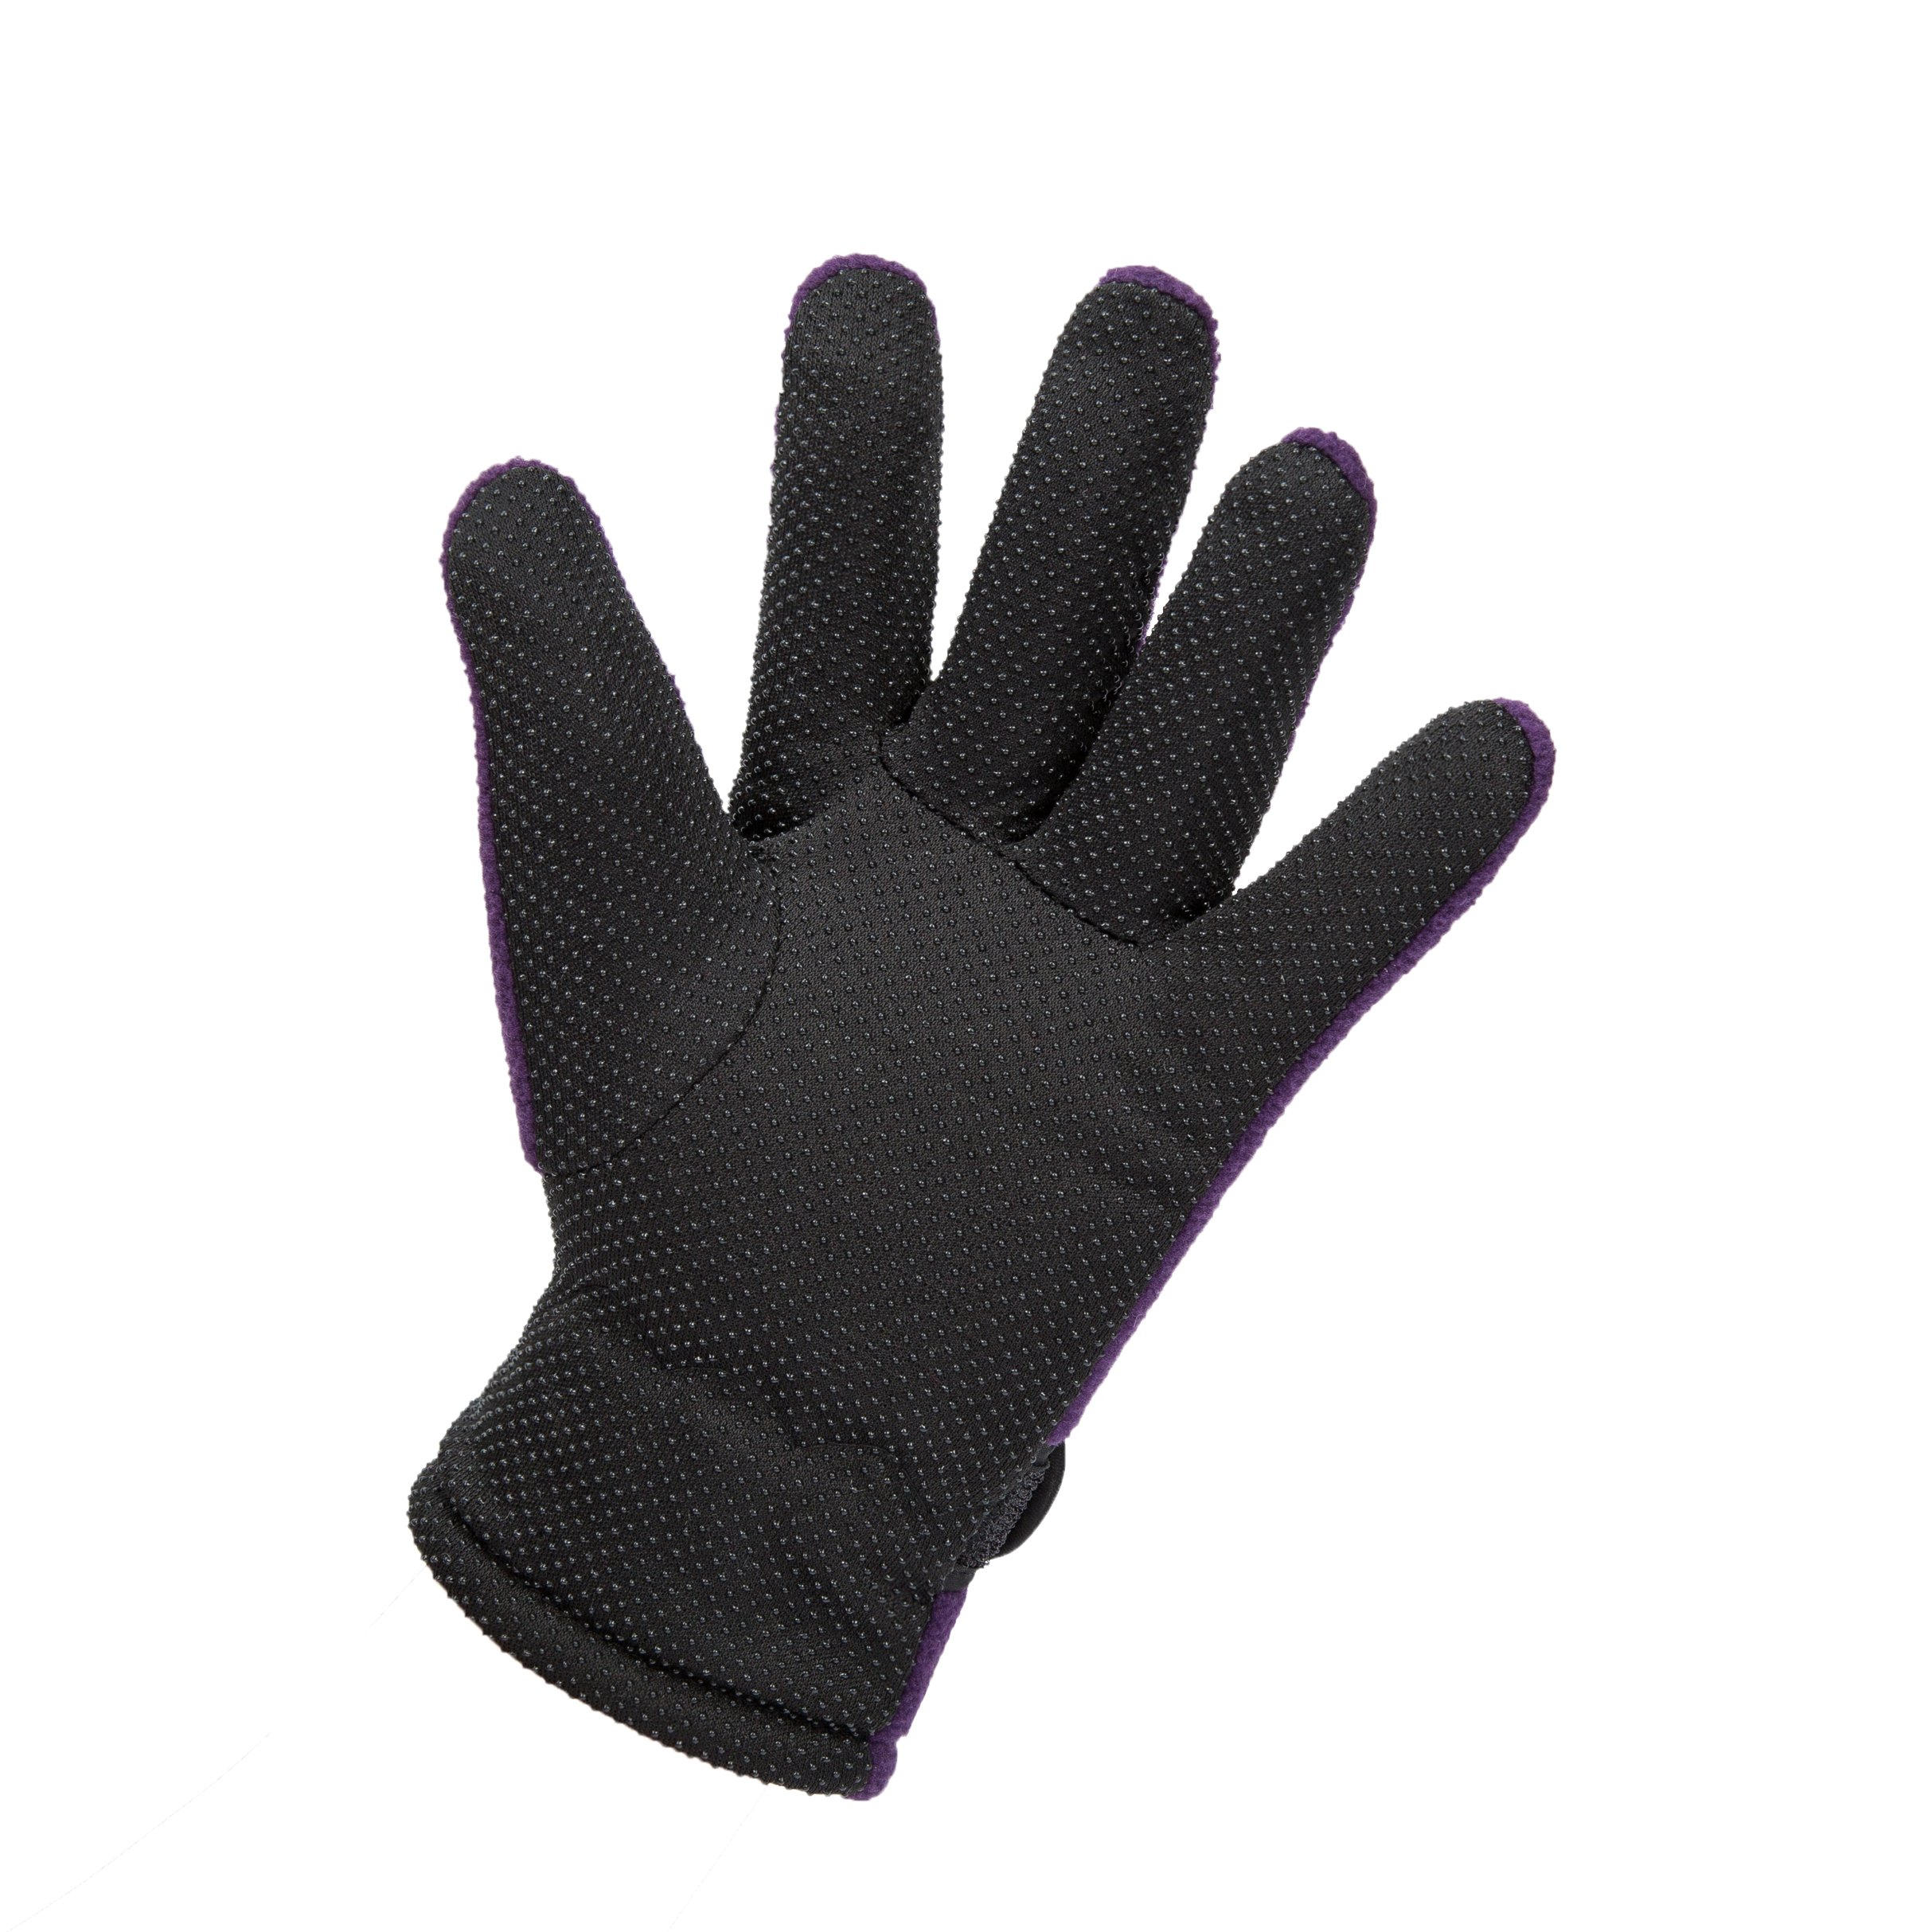 Black Boy girls Women Winter Gloves Anti Slip Fleece Lining For Hiding Snowboard Driving Ski by KimmyKu (Image #3)